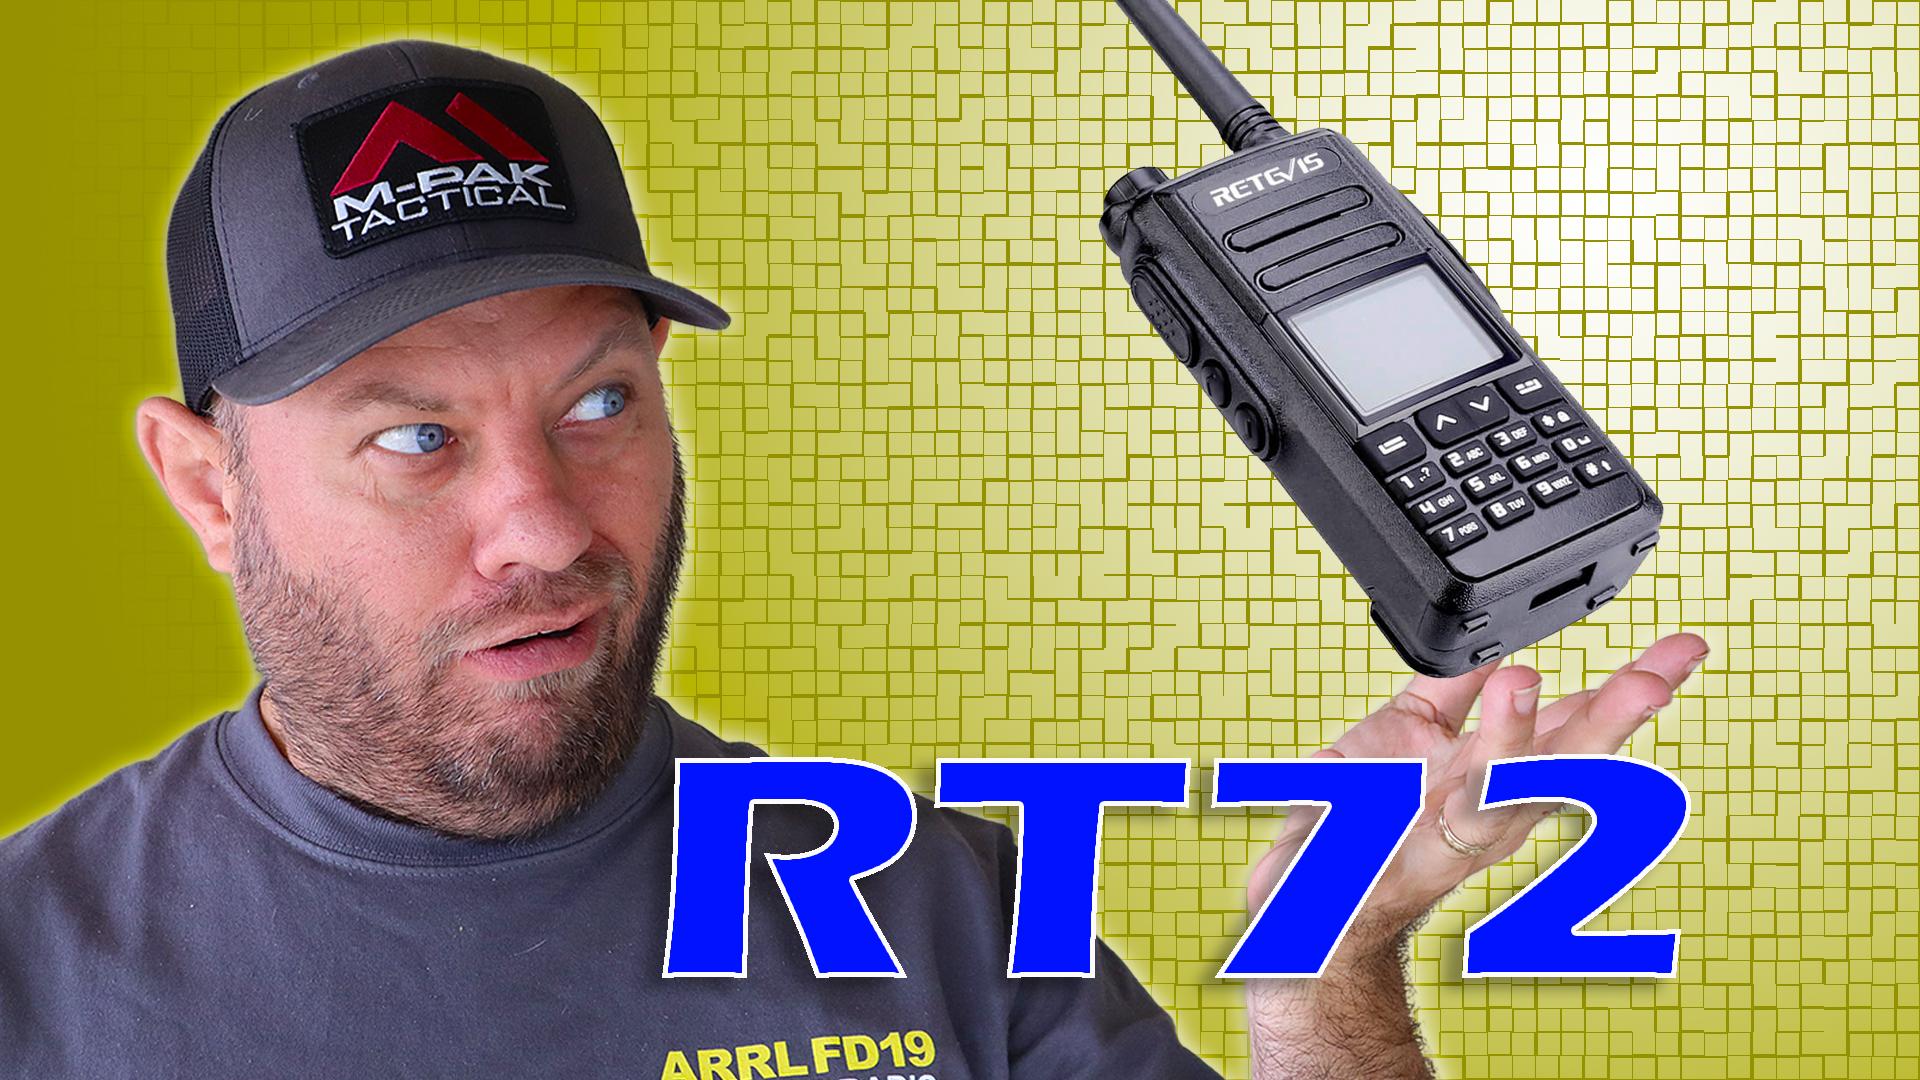 Episode 460: Retevis REVEALS the RT-72 Dual Band DMR Handheld Ham Radio